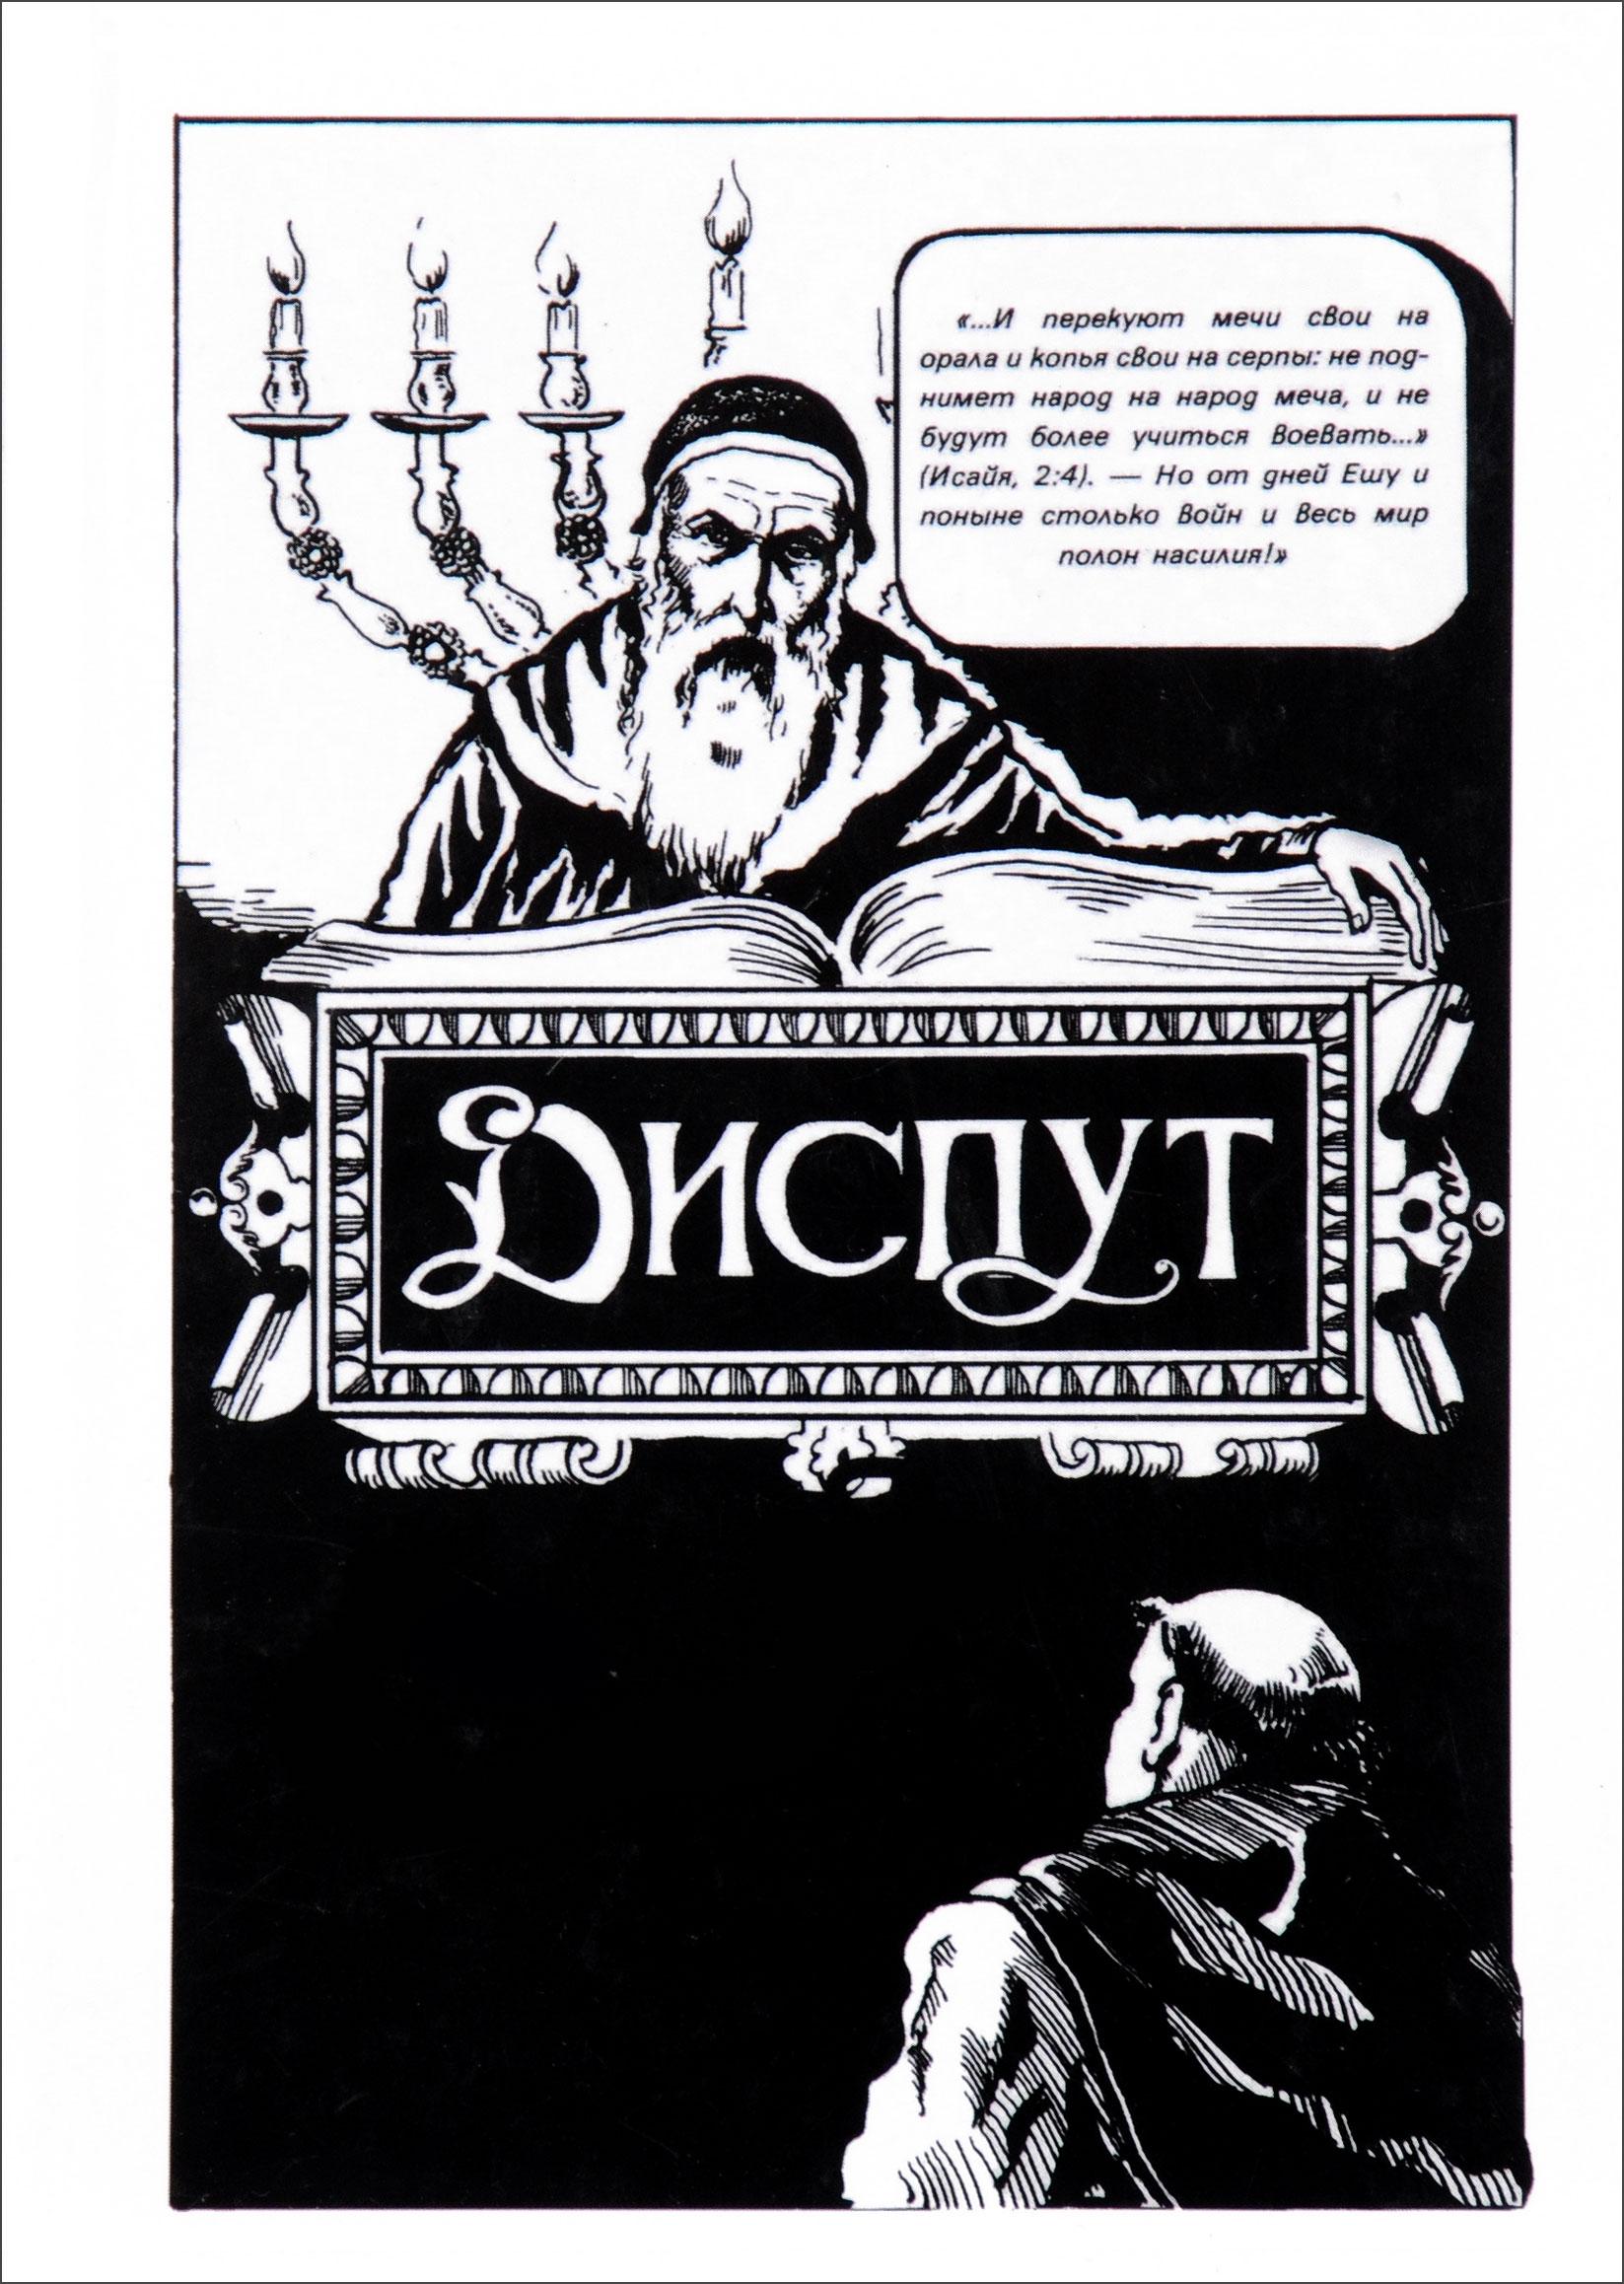 Б. Хаскелевич Диспут Нахманида б у книги по медицине в минске